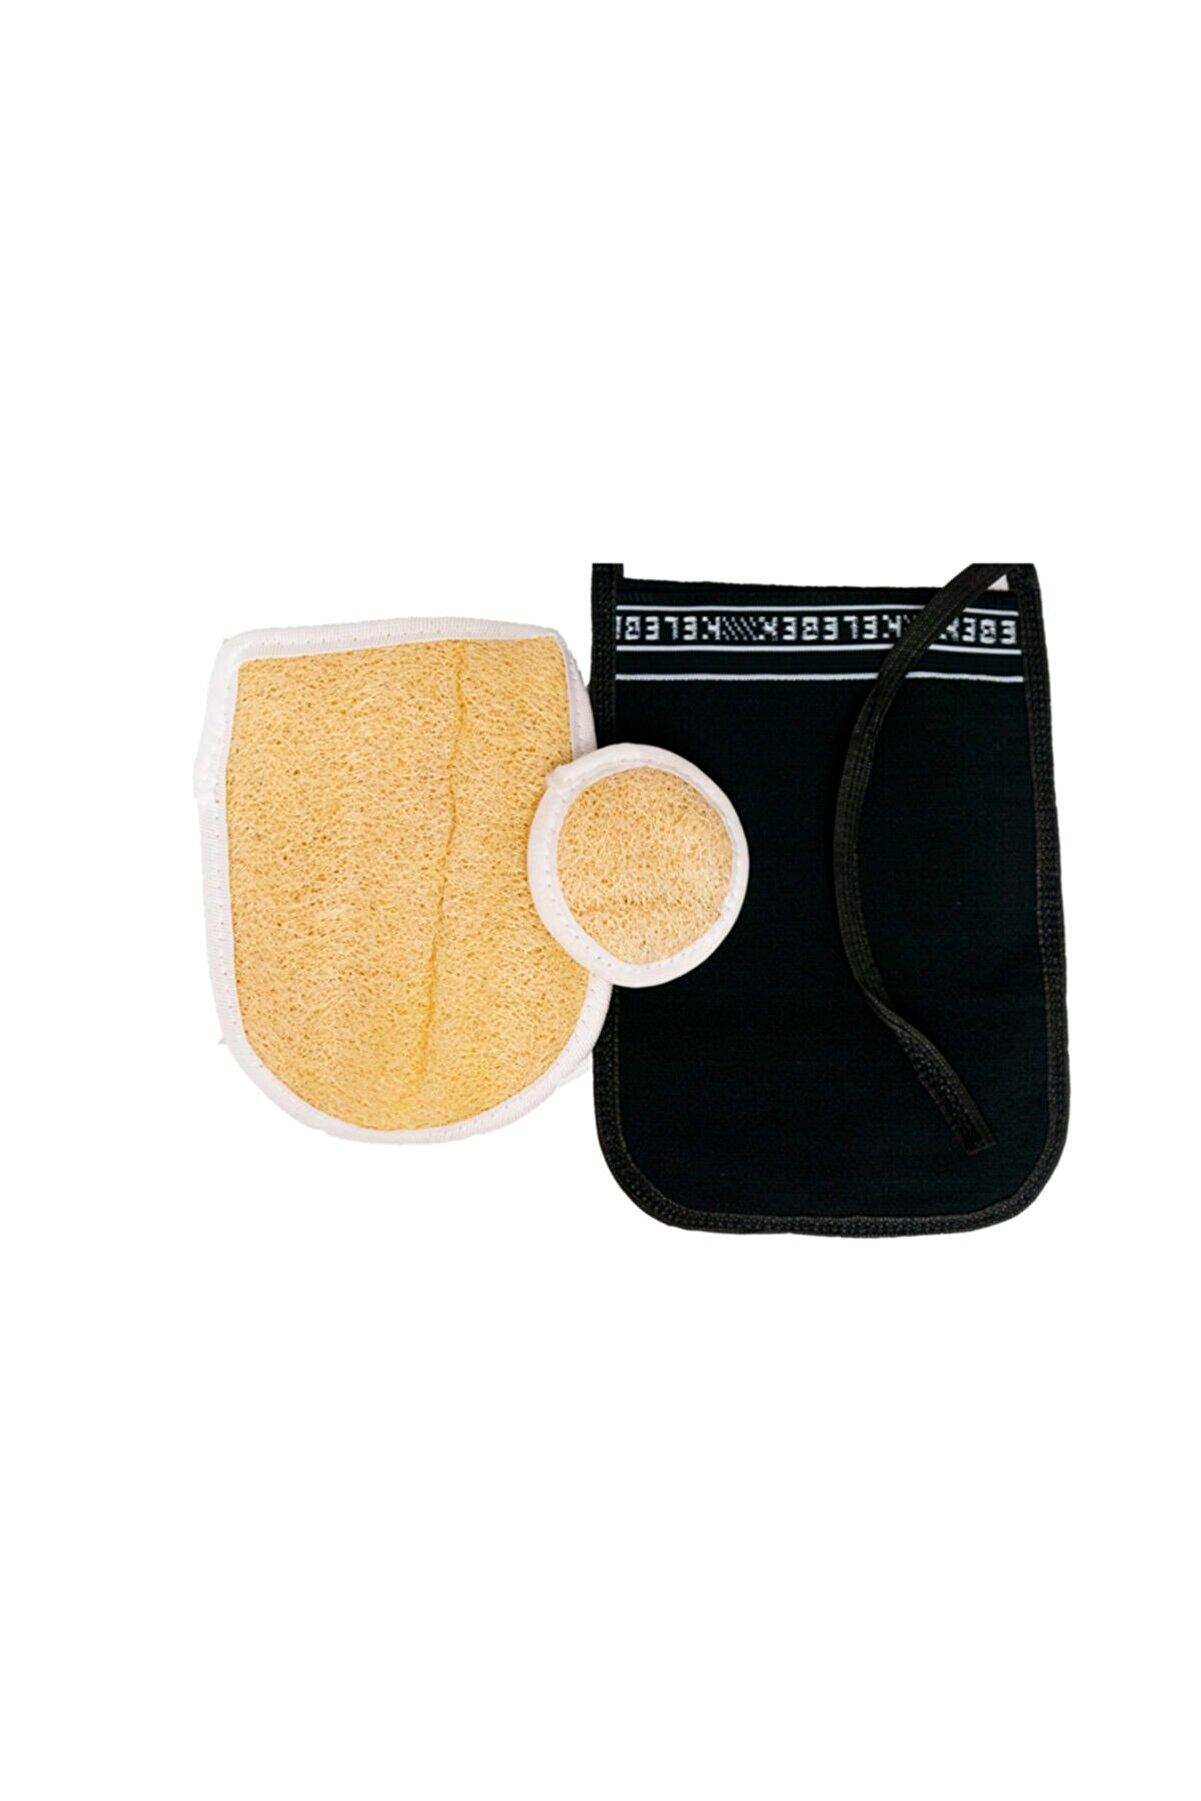 Anatolia Soap Kabak Lifi Vücut + Yüz Kabak Lifi + Kelebek Kese Siyah